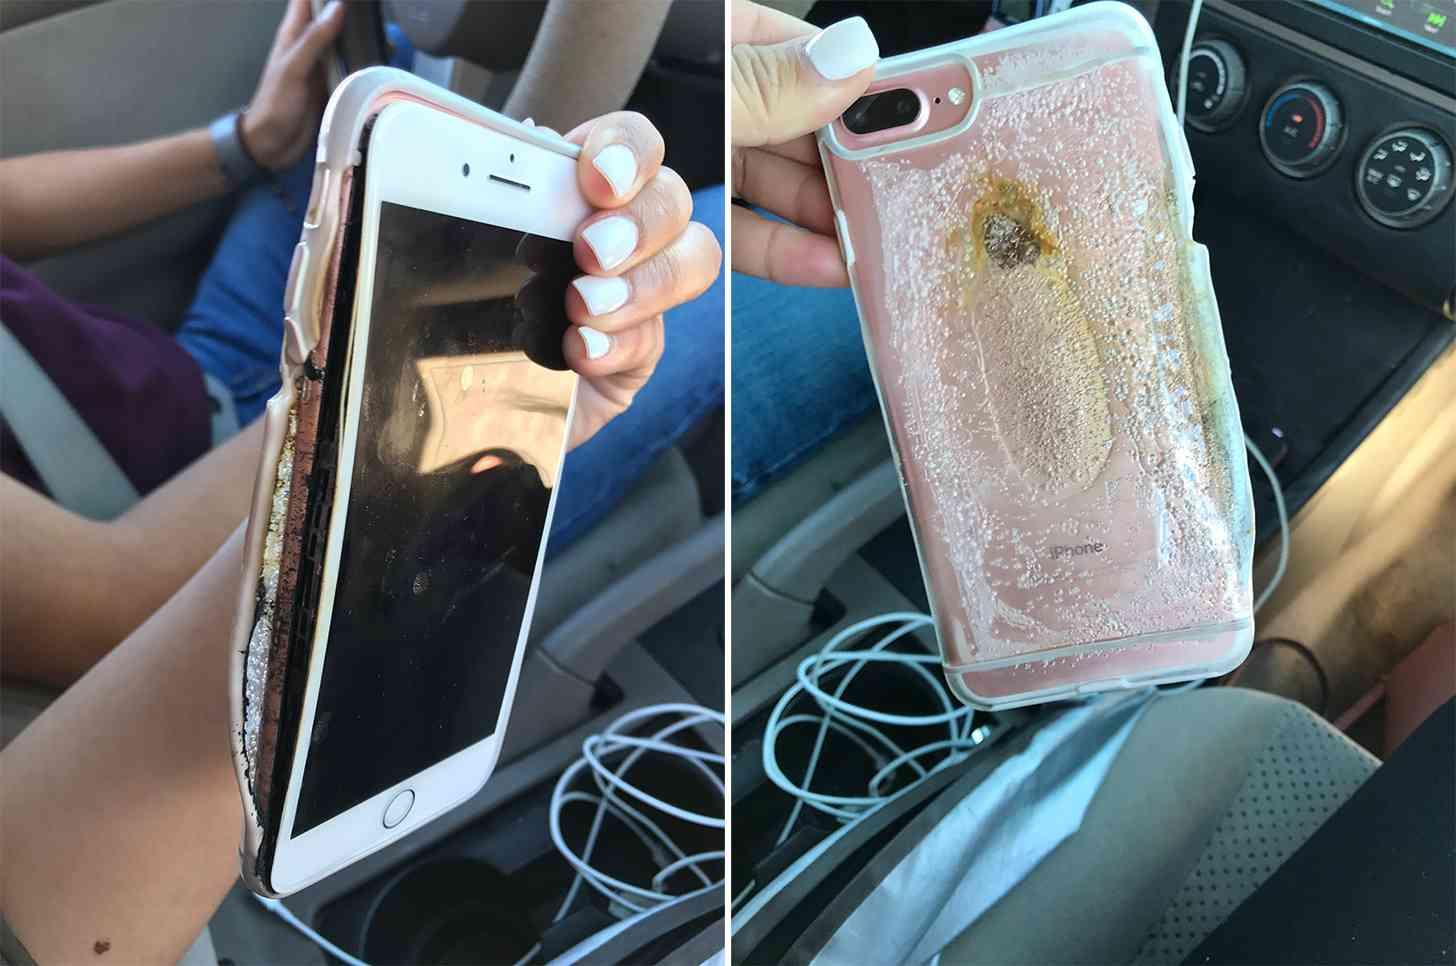 iPhone 7 Plus smoking, melted case